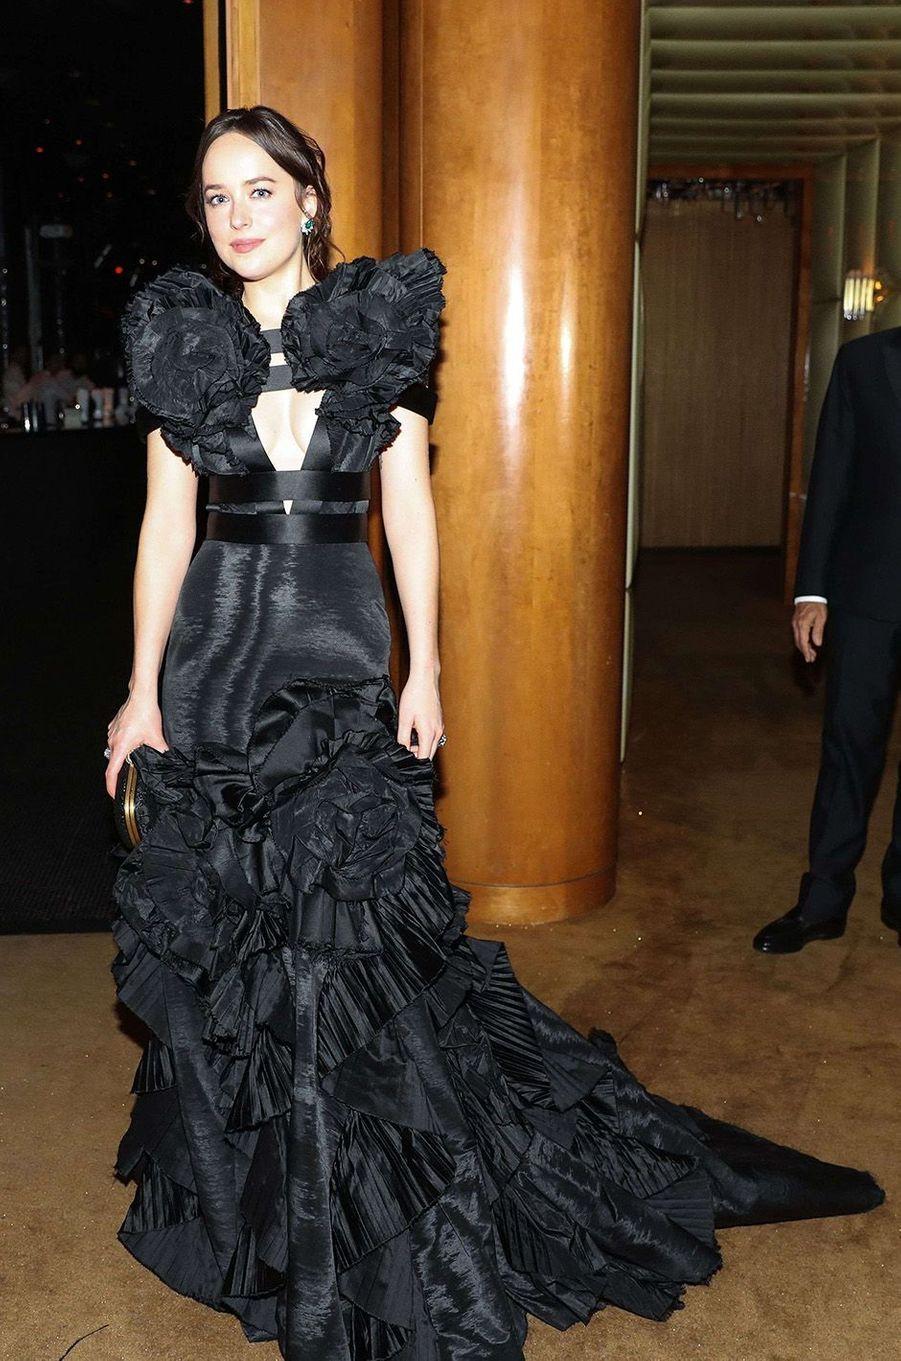 Dakota Johnsonà l'after-party du Met Gala 2017.